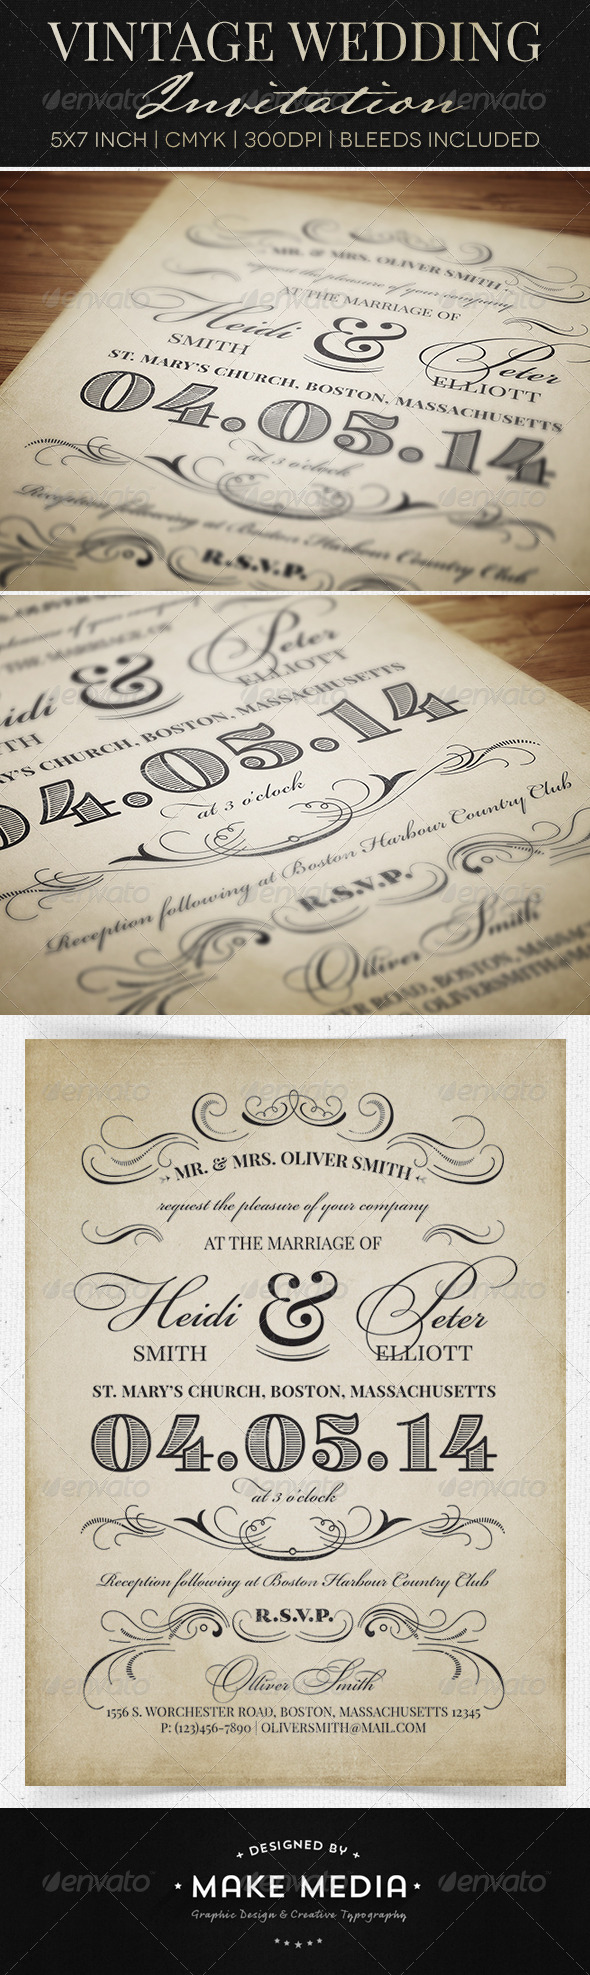 Vintage Wedding Invitation by MakeMediaCo | GraphicRiver